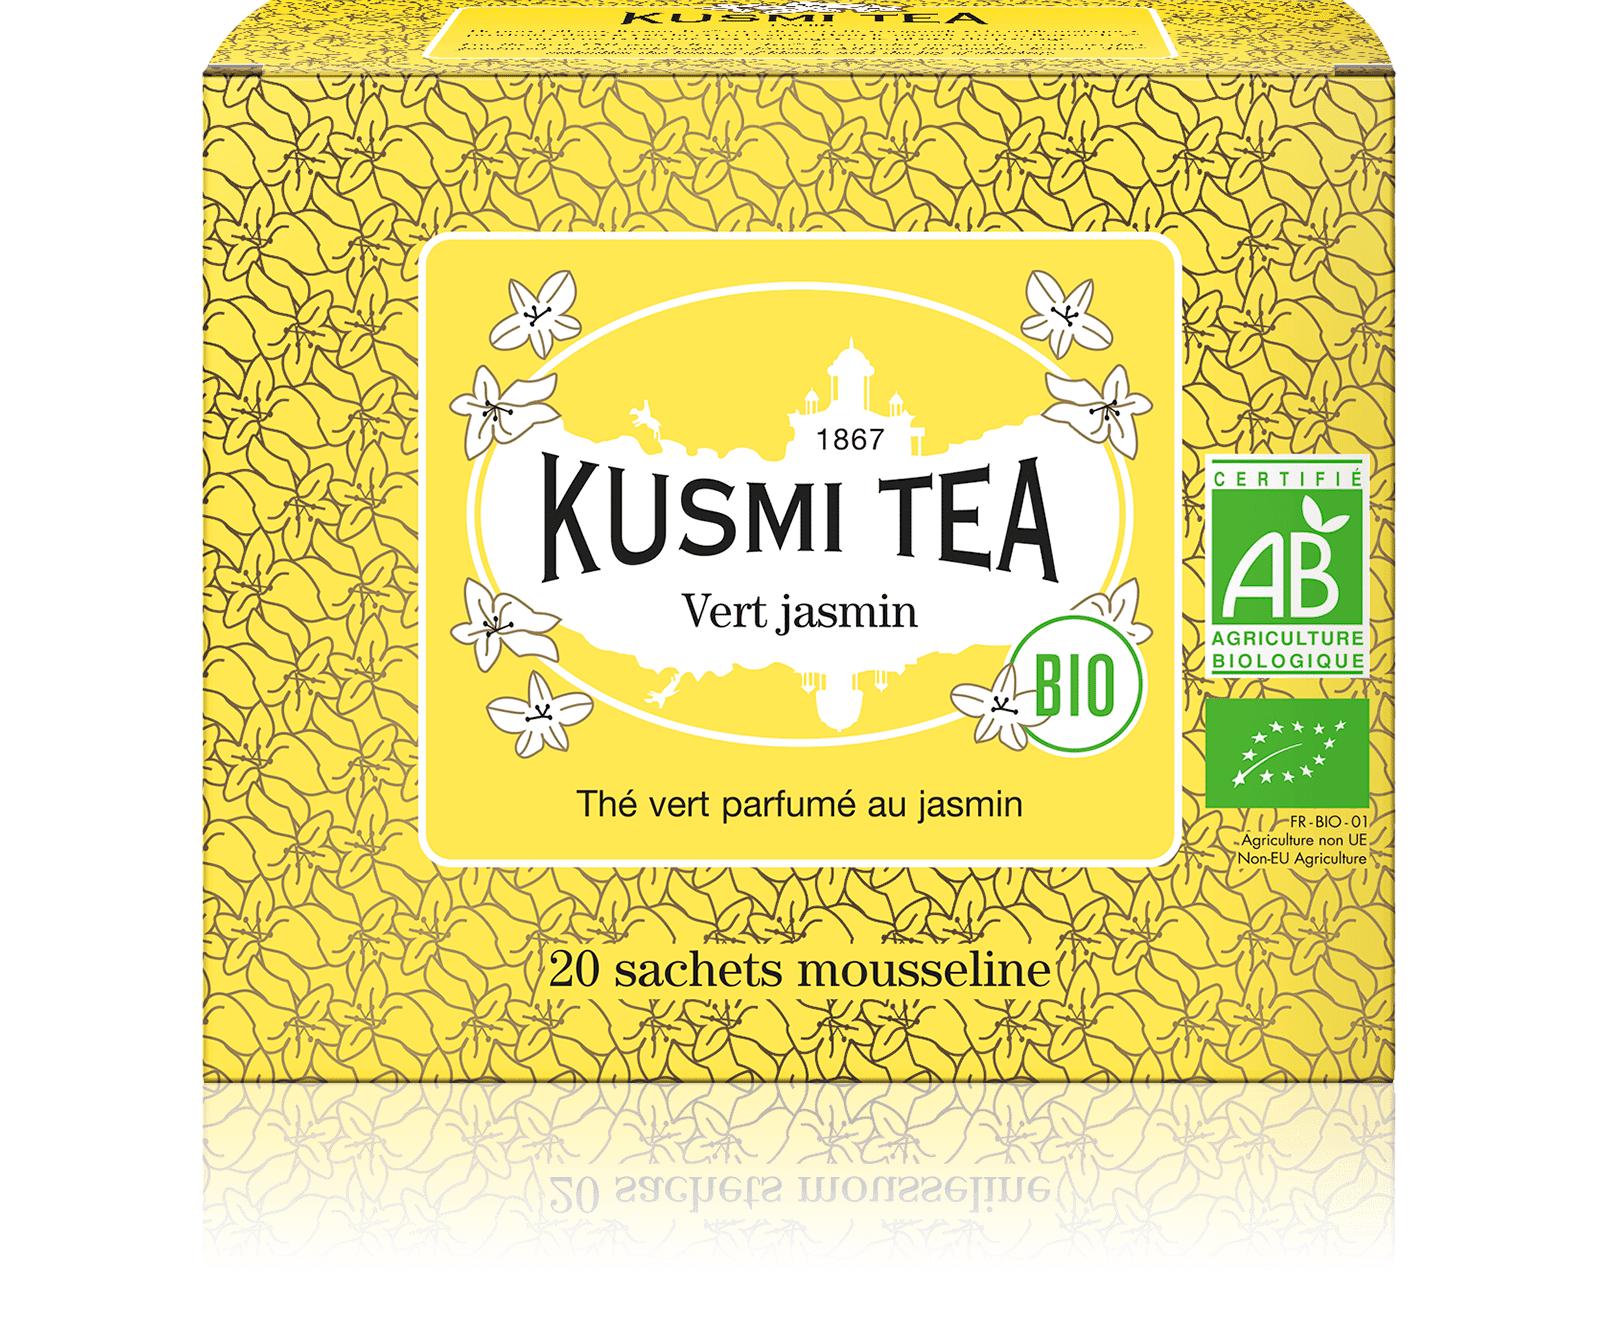 KUSMI TEA Vert Jasmin bio - Thé vert au jasmin - Sachets de thé - Kusmi Tea